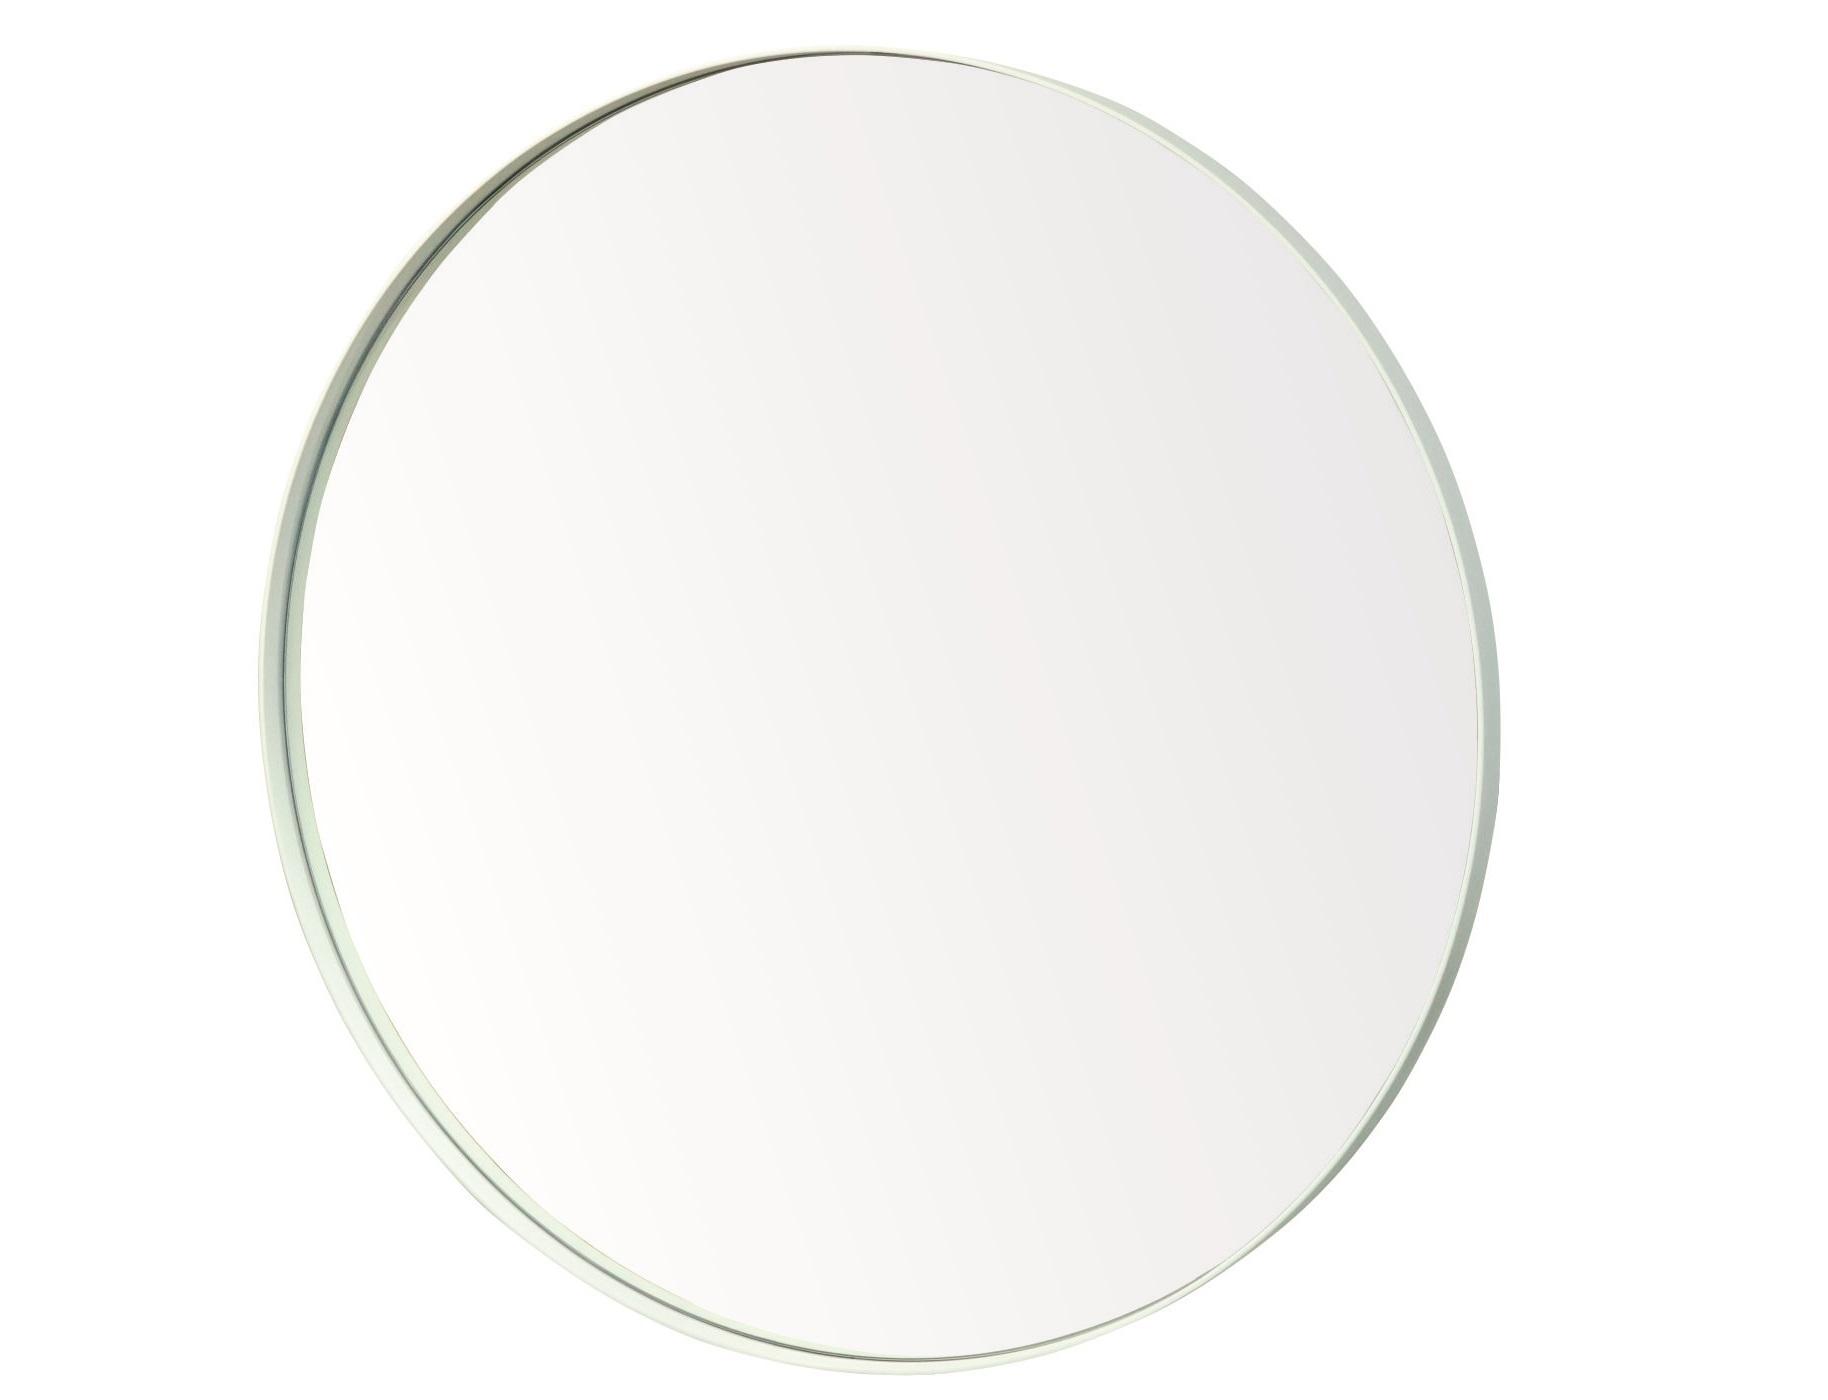 Настенное зеркало гала 90*90 (simple mirror) белый 4 см.